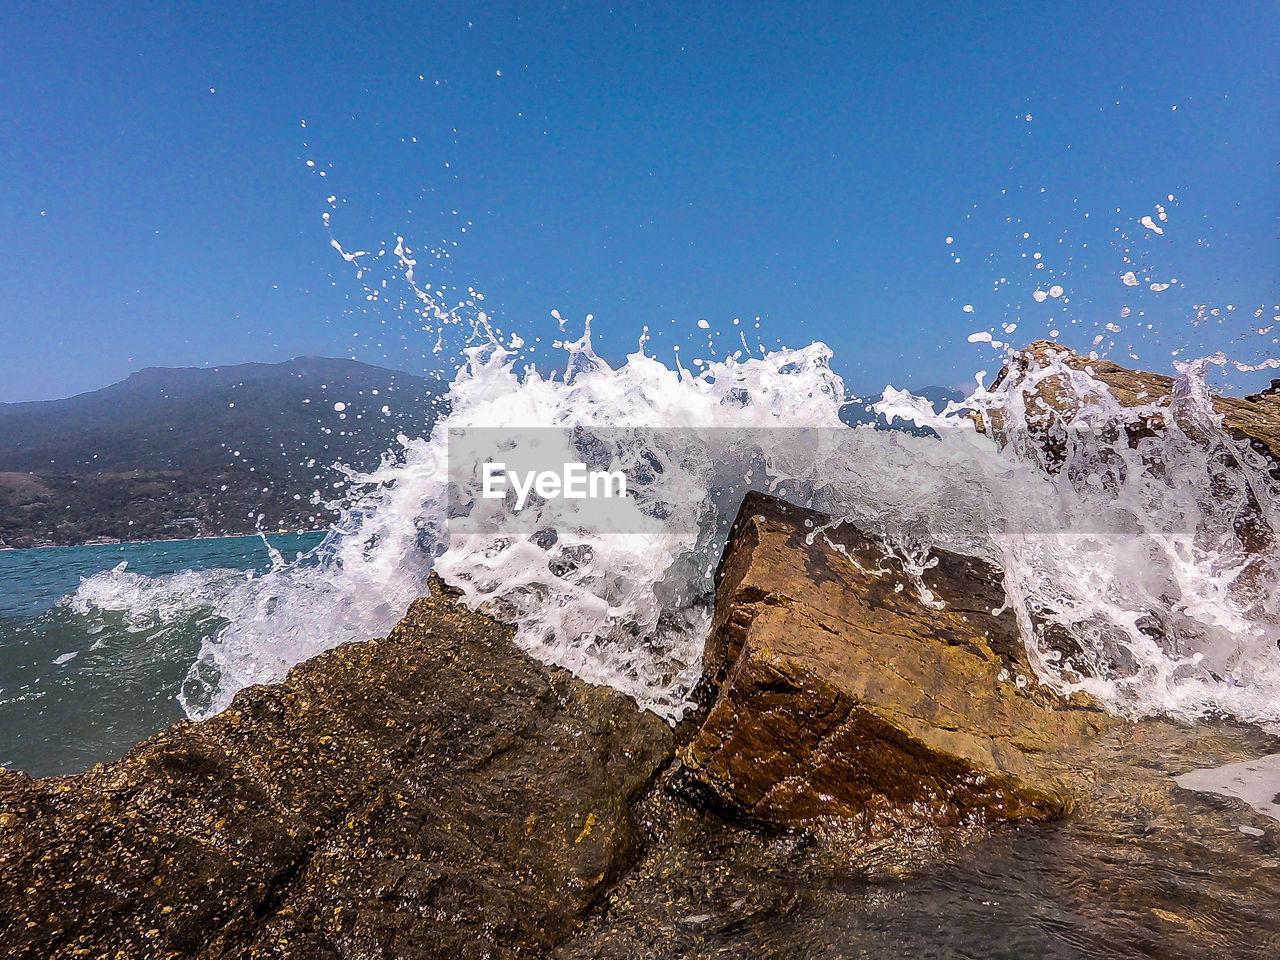 Waves splashing on rocks against clear blue sky